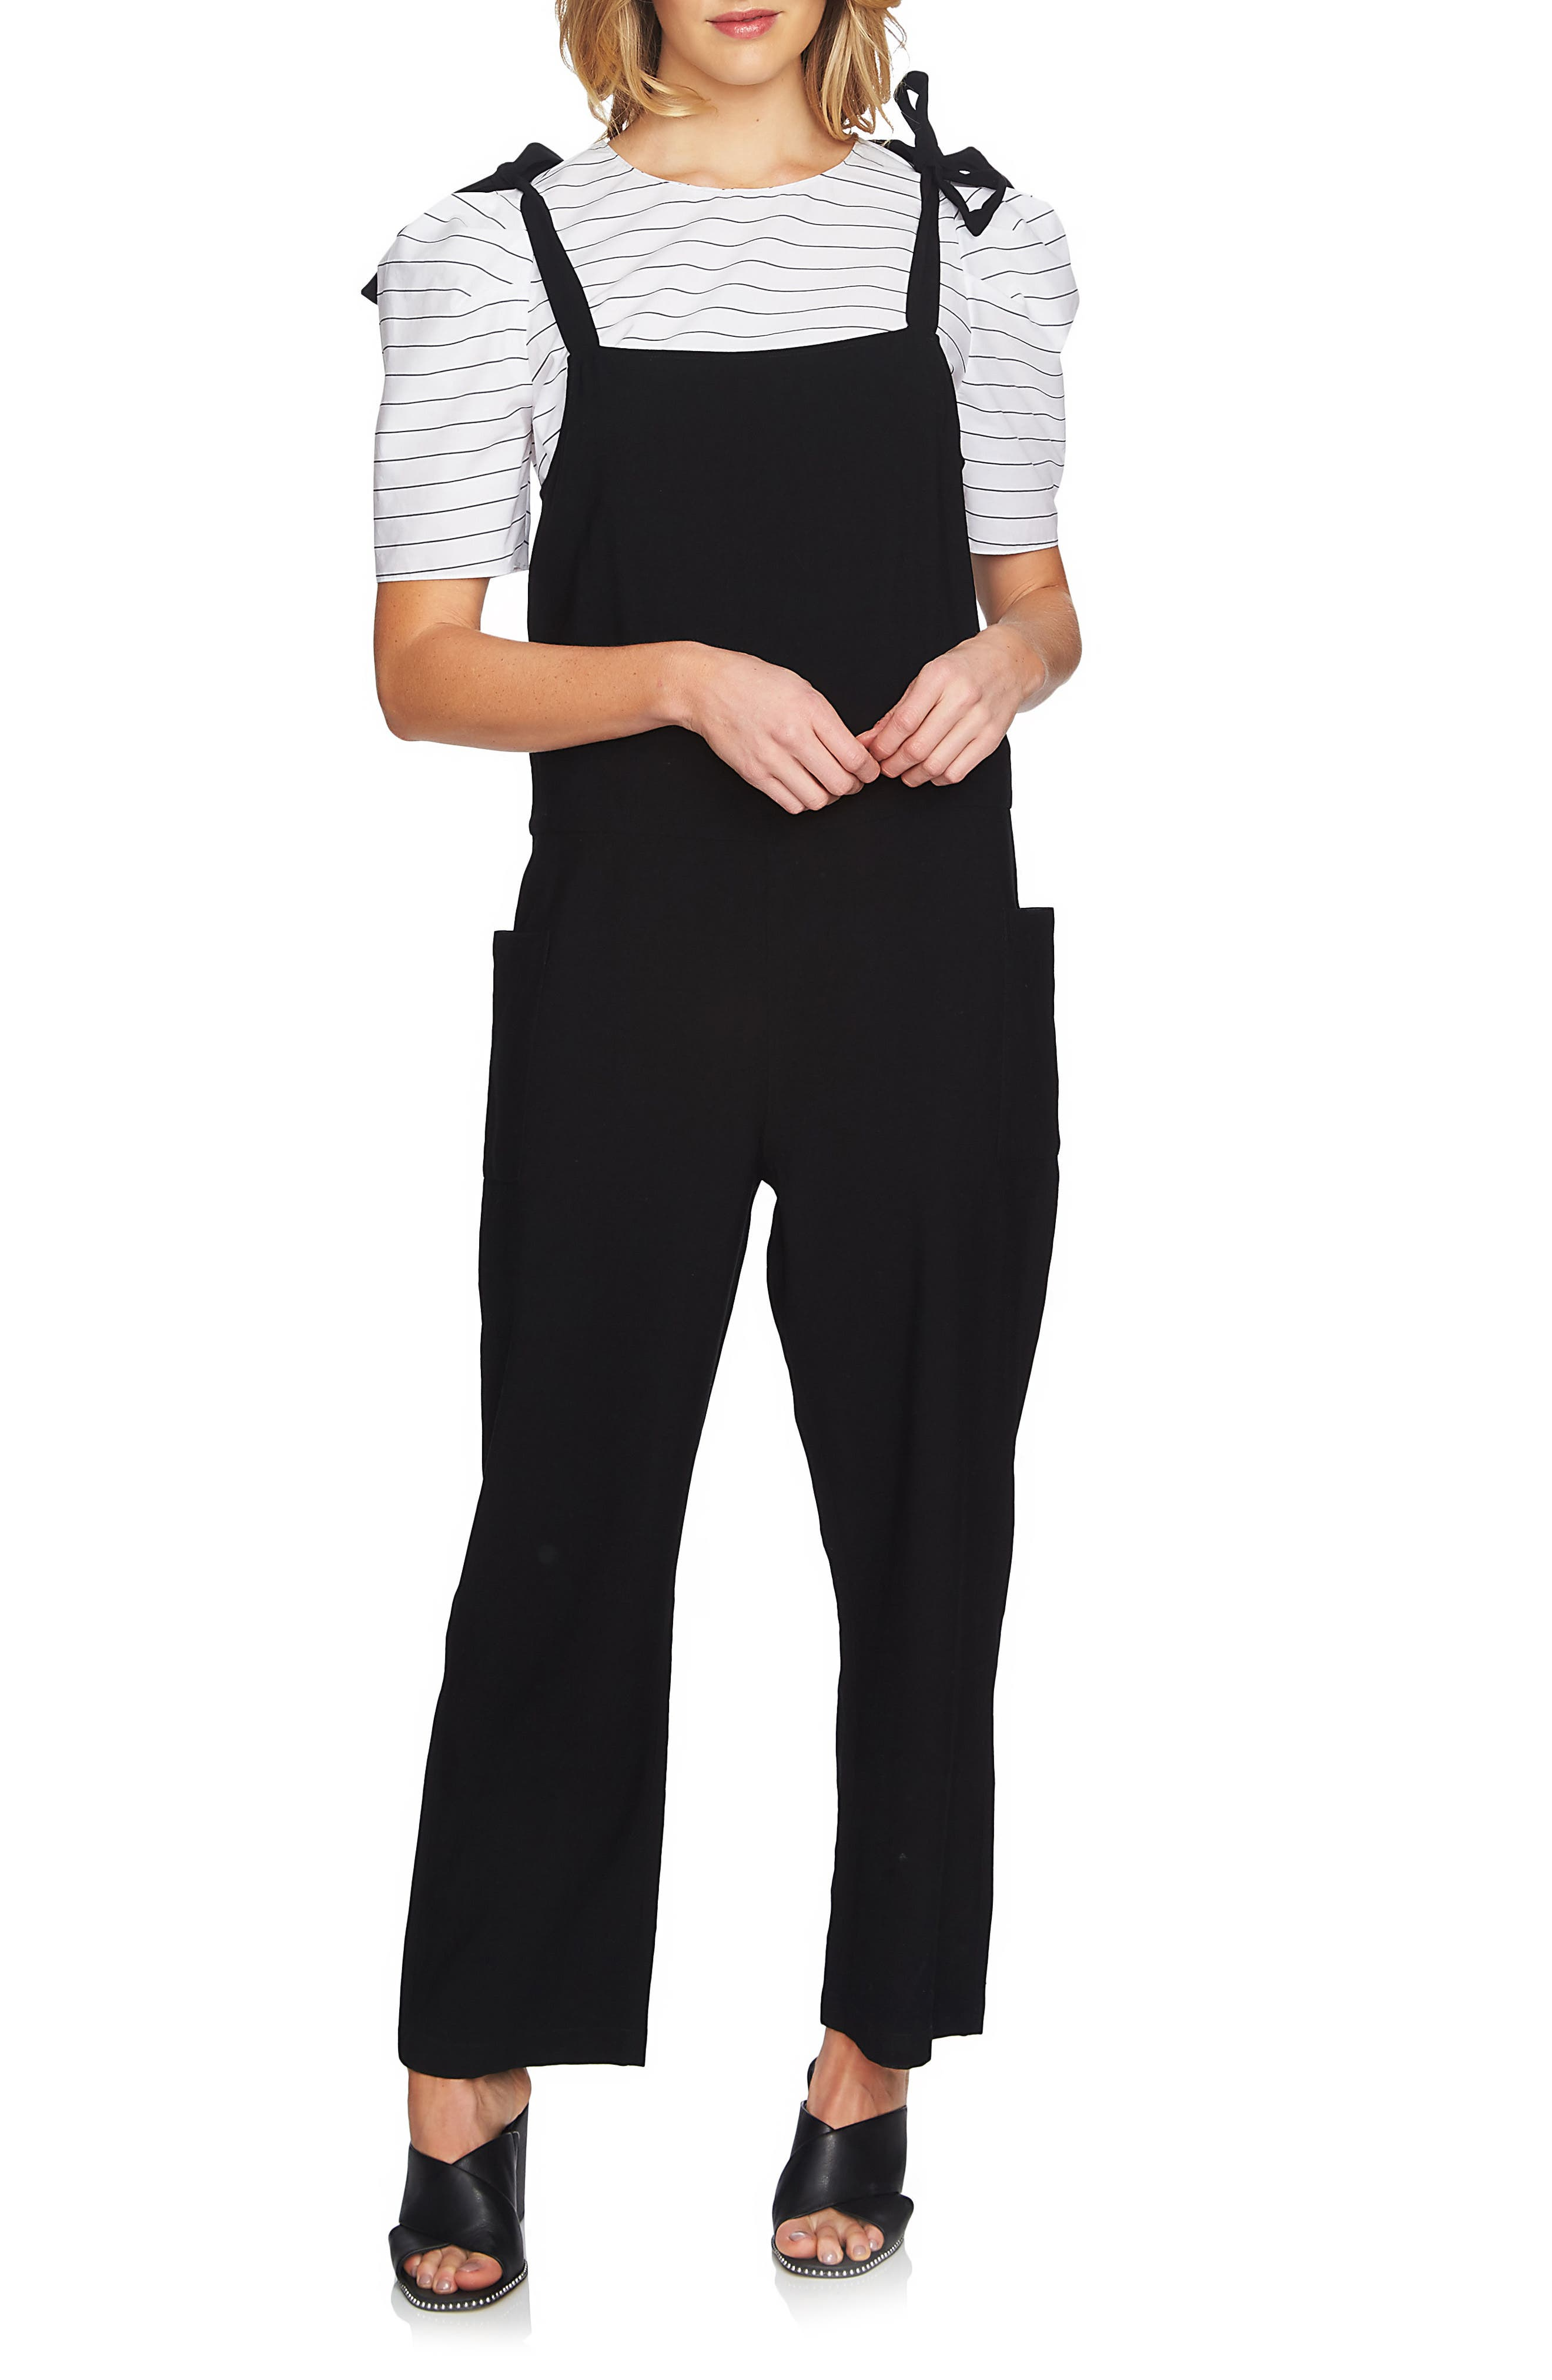 Alternate Image 1 Selected - 1.STATE Tie Shoulder Overalls